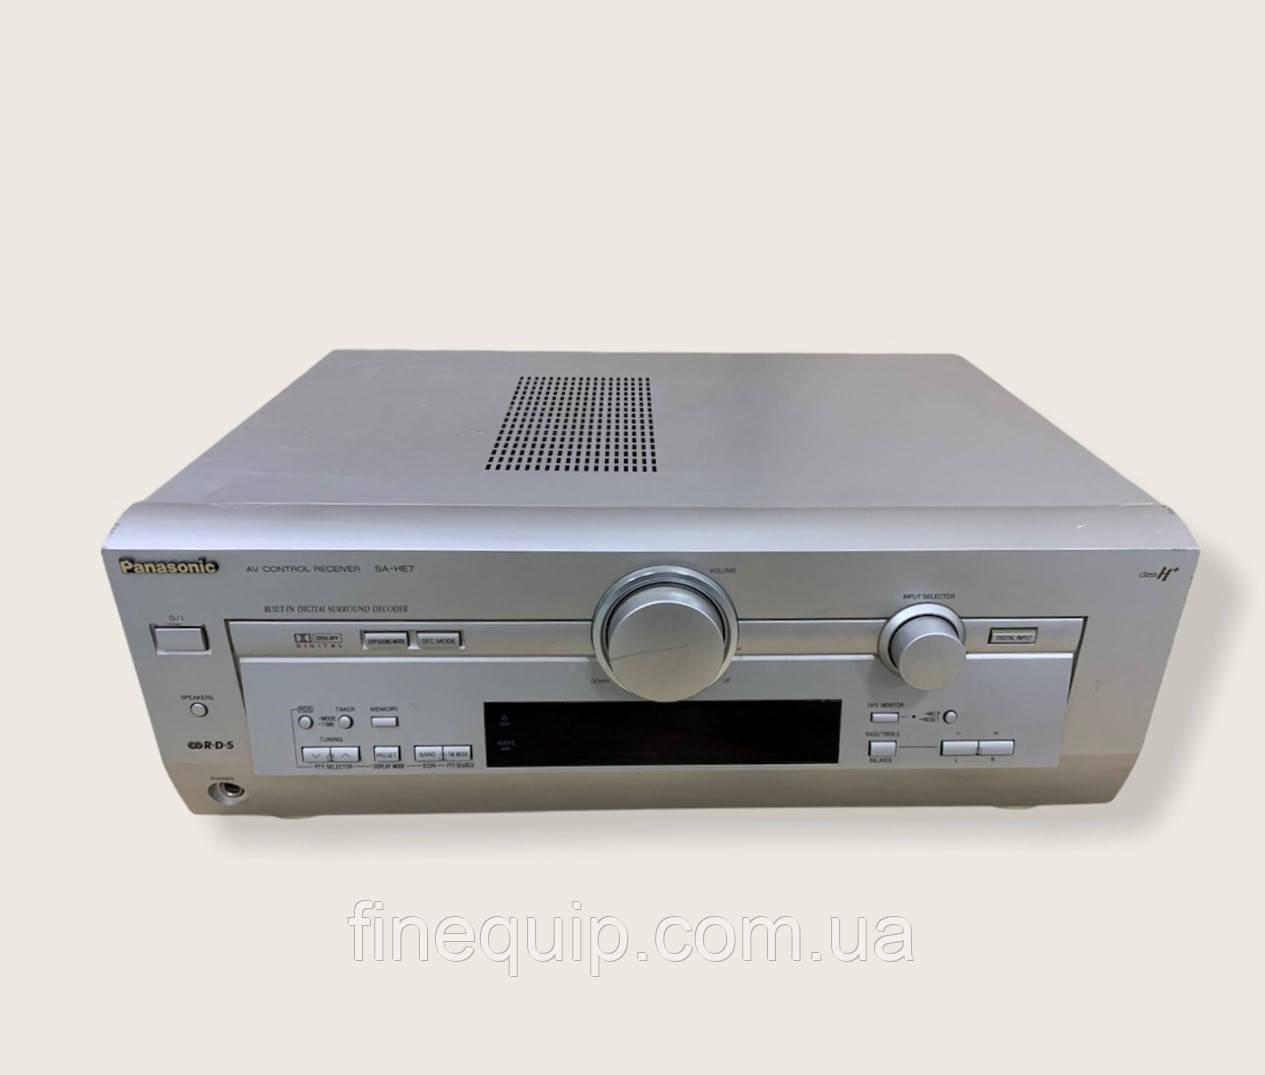 Ресивер Panasonic SA-HE7 -Б/У